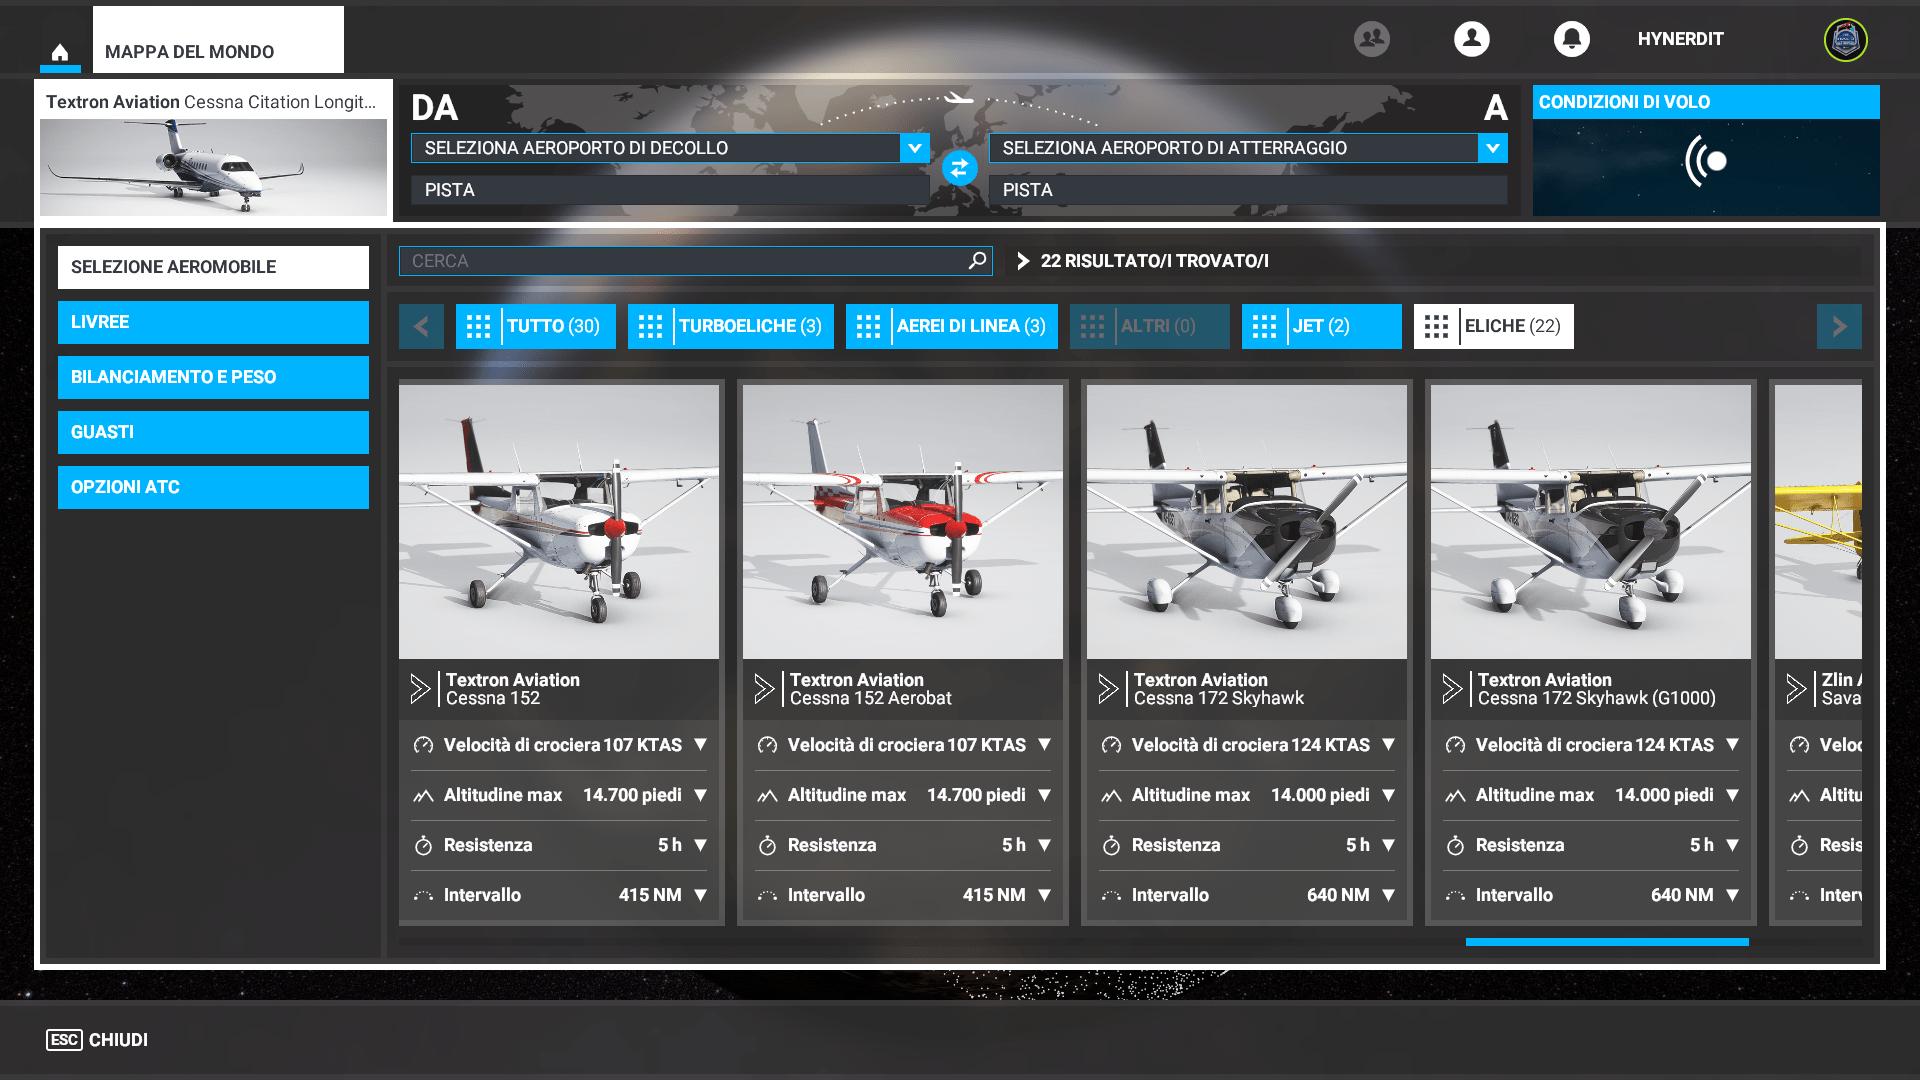 Microsoft Flight Simulator 2020: La Recensione 13 - Hynerd.it